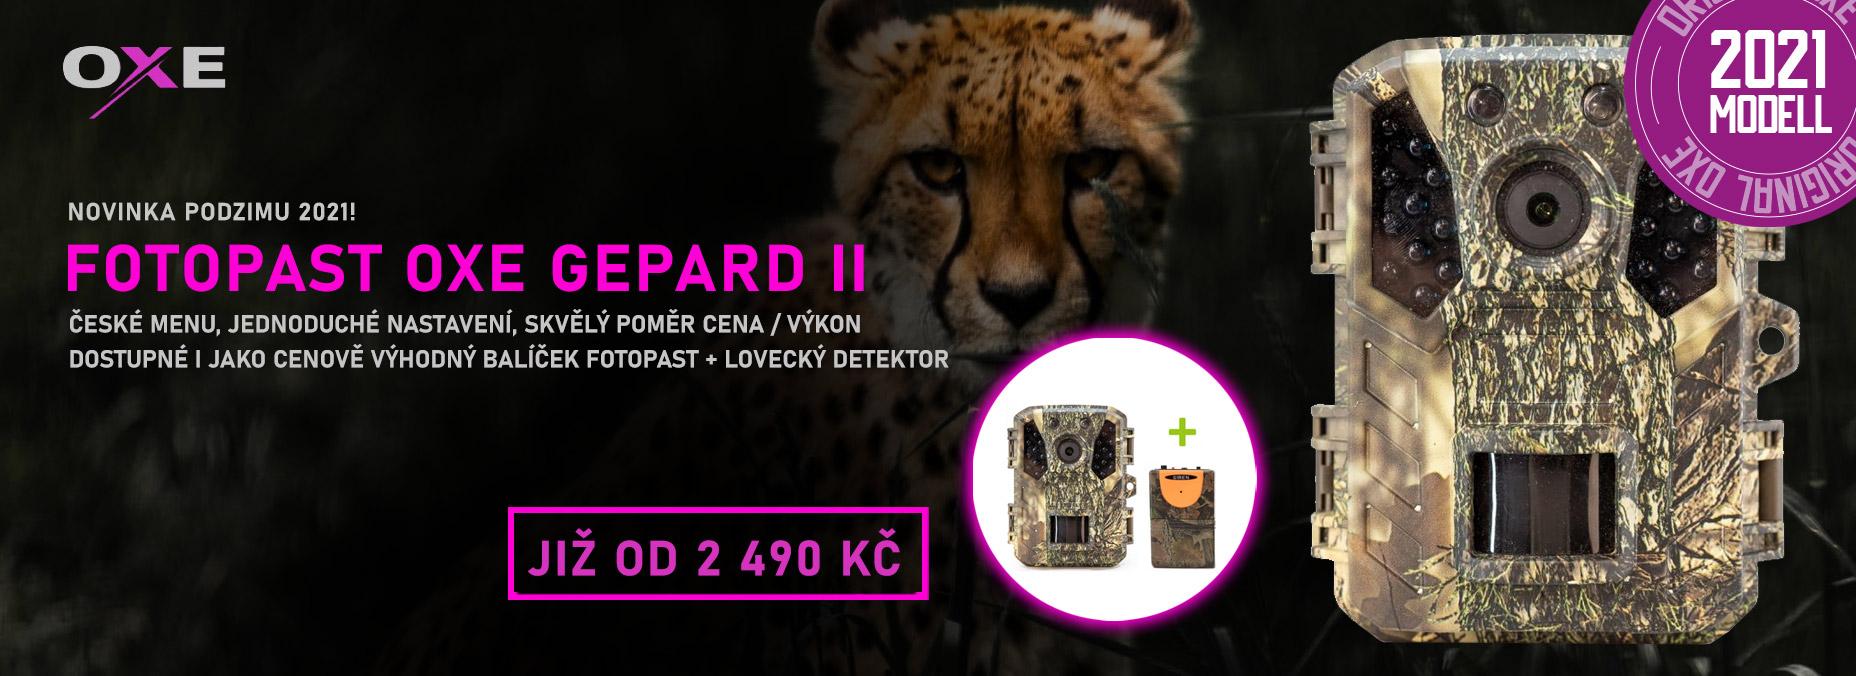 Fotopast OXE Gepard